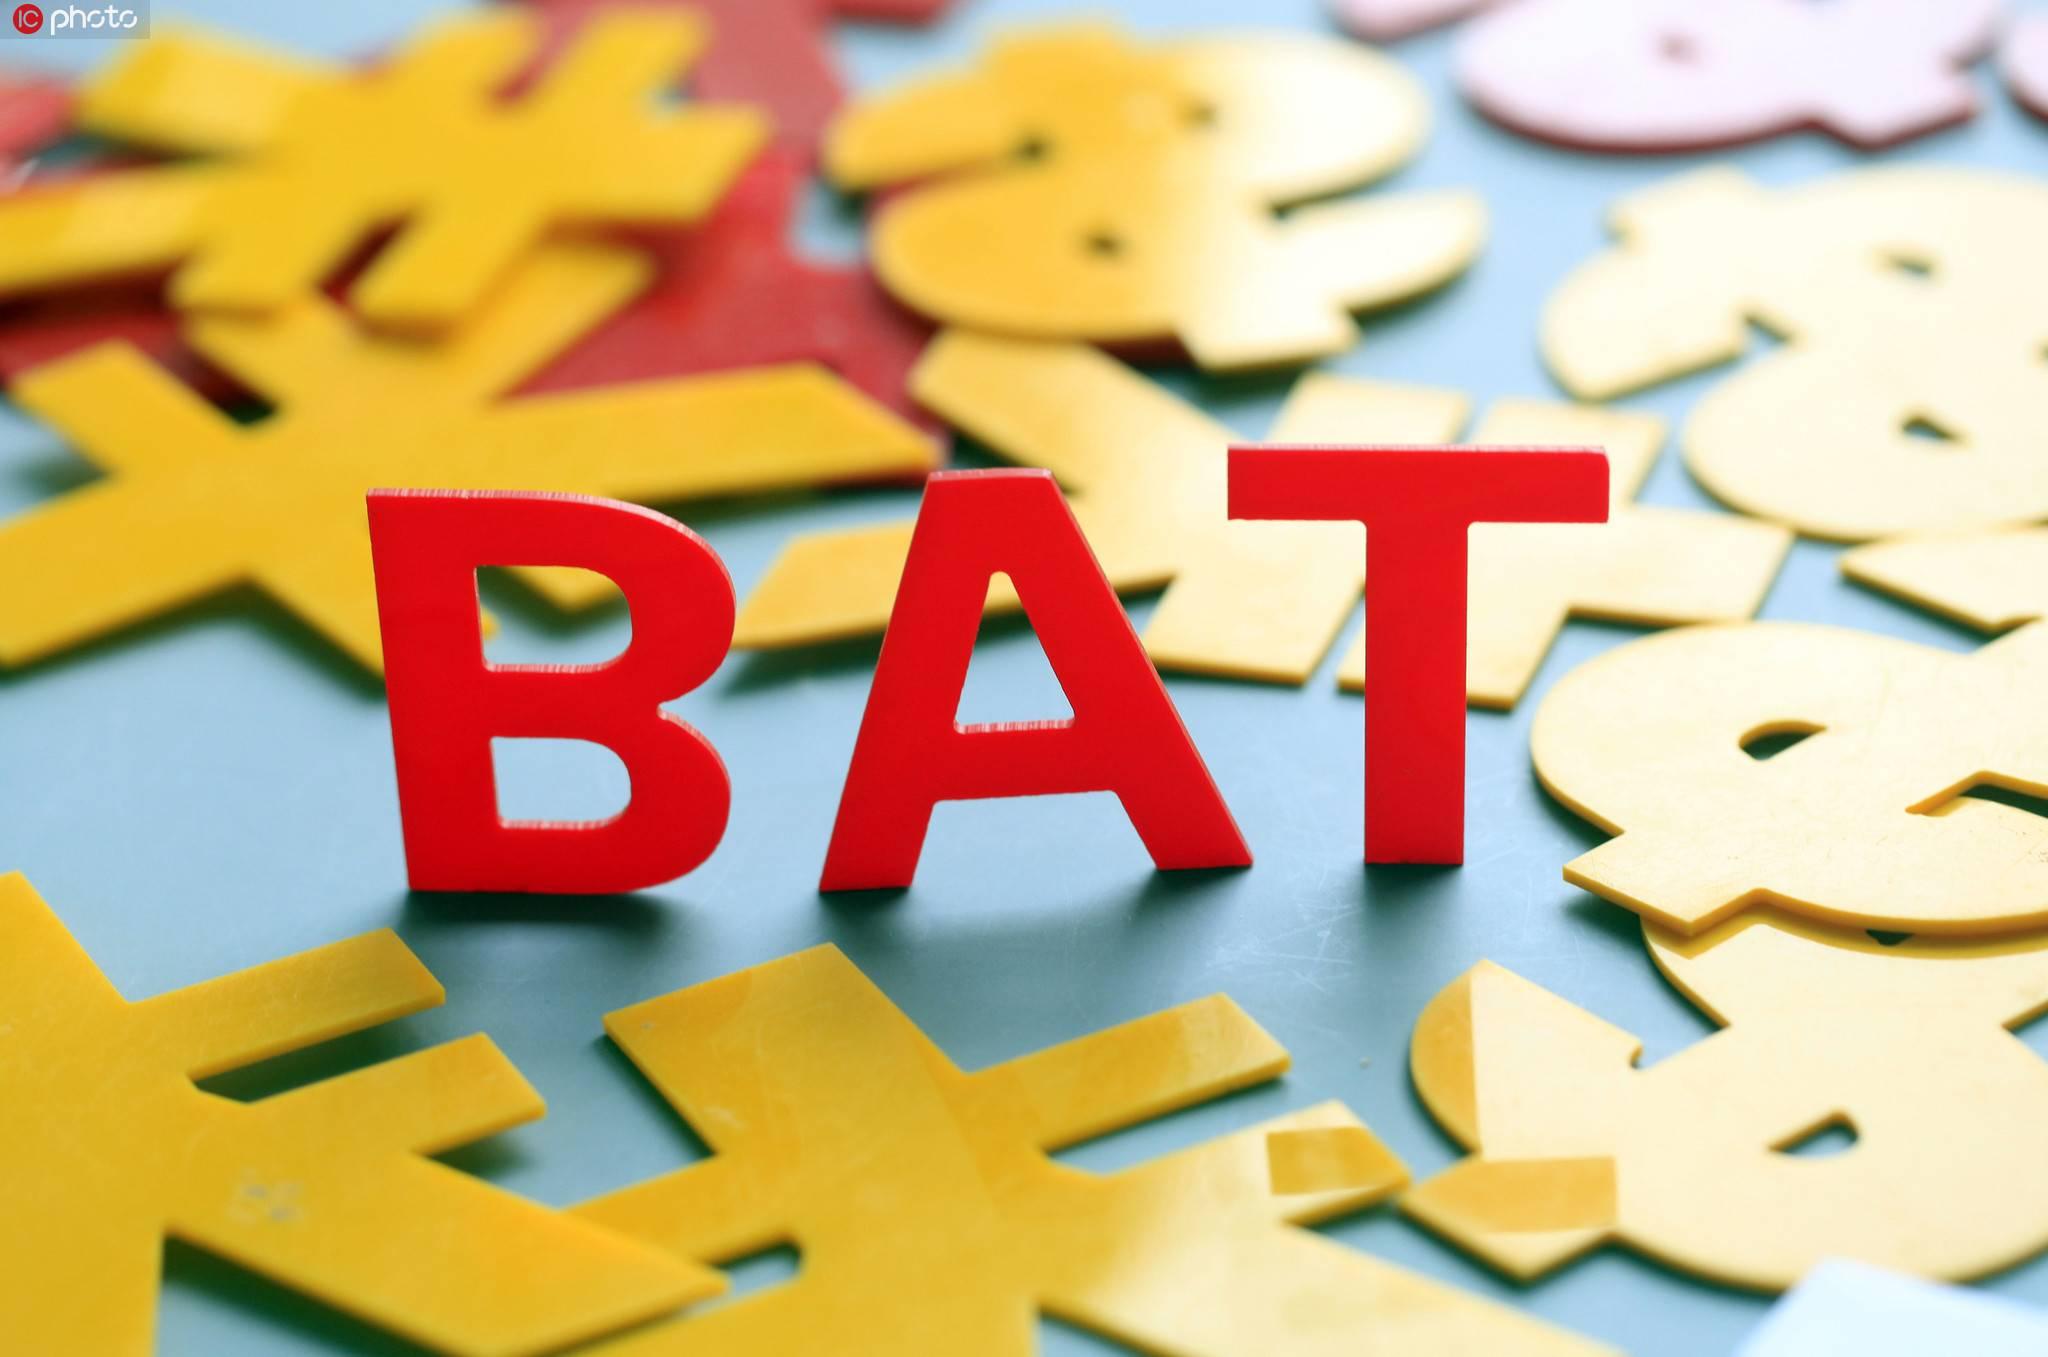 BAT,亿欧智库,蚂蚁金服